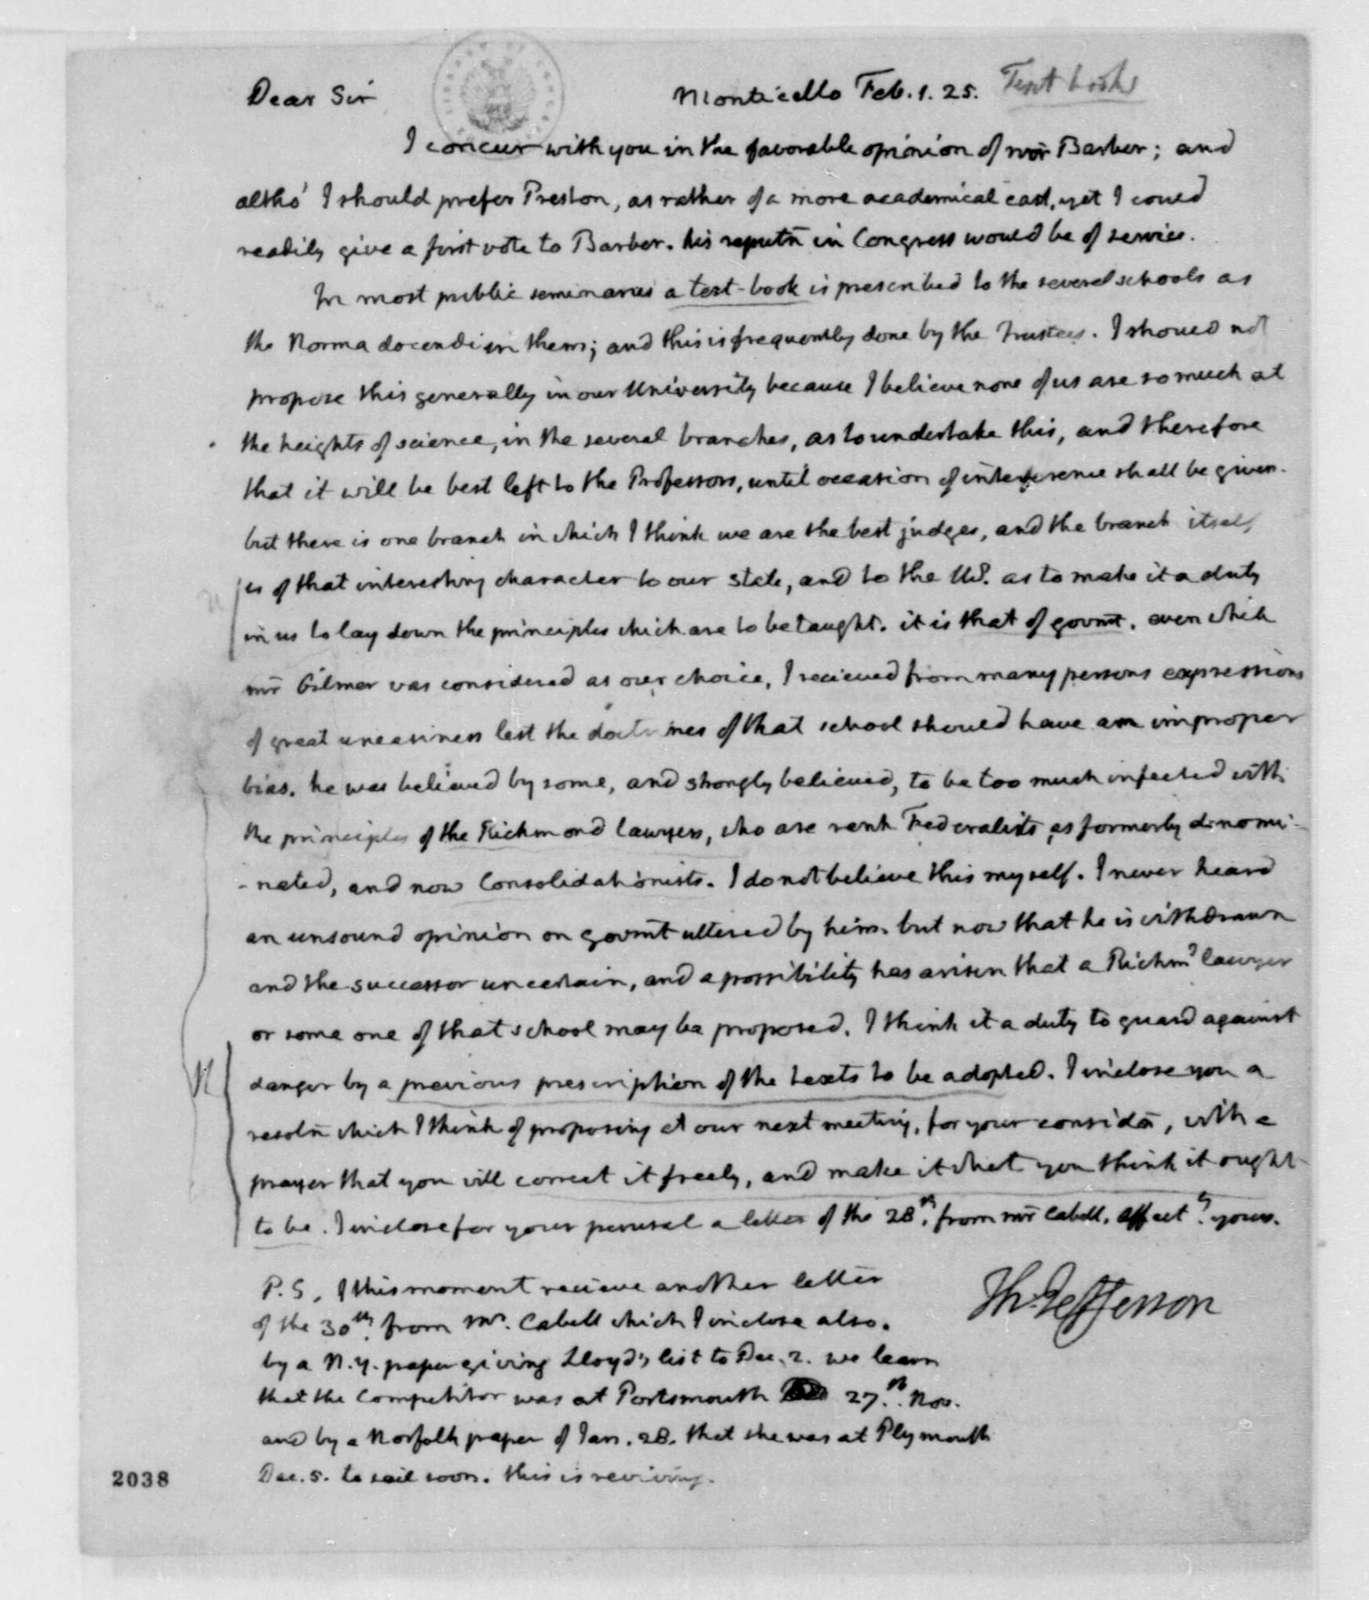 Thomas Jefferson to James Madison, February 1, 1825.